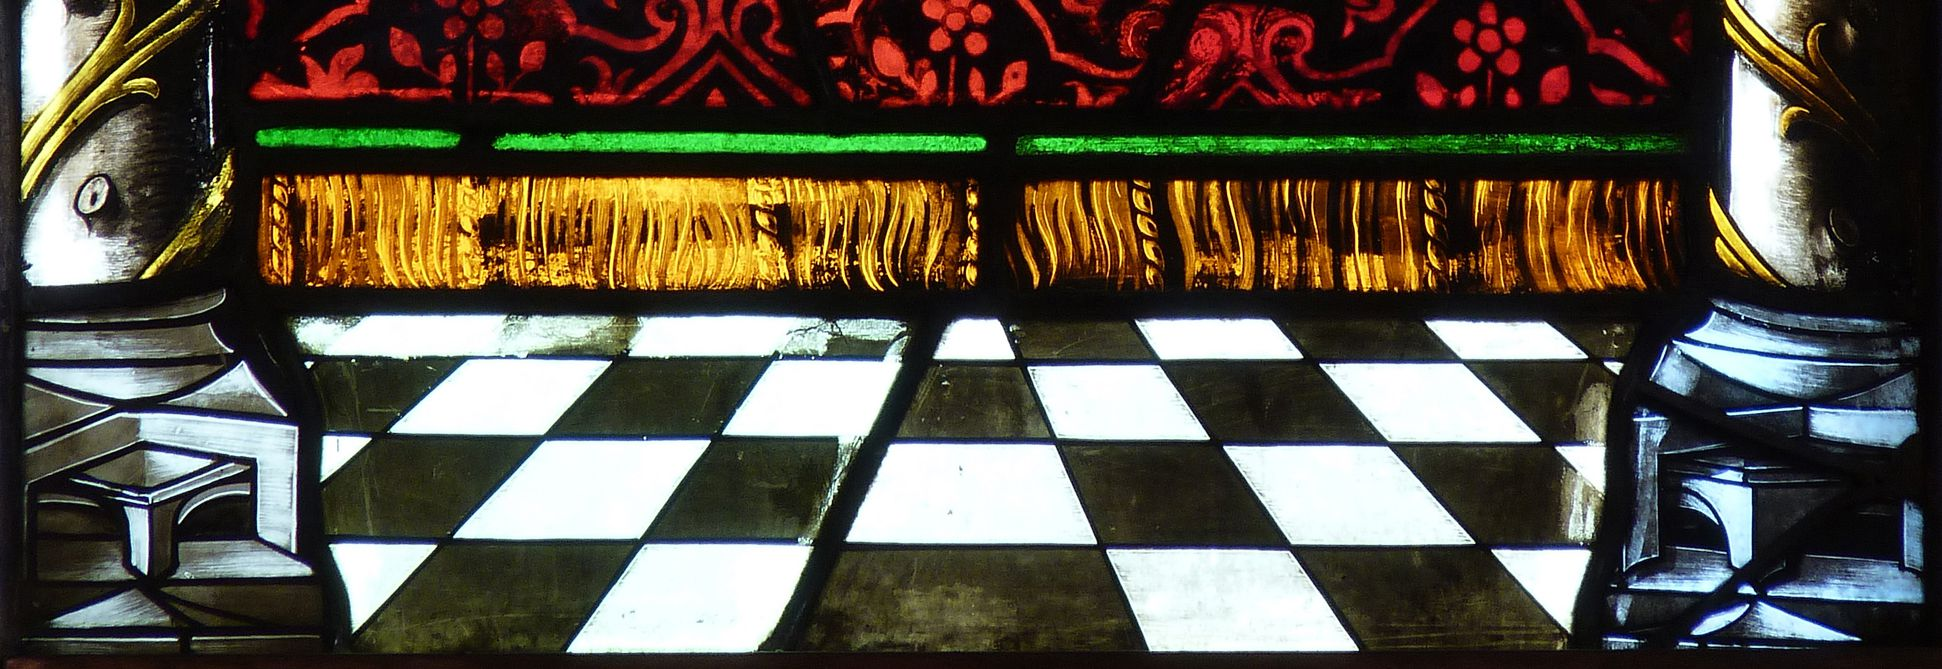 St. Bartholomäus, Chorfenster n II Erste Zeile, Fenster a, Detail